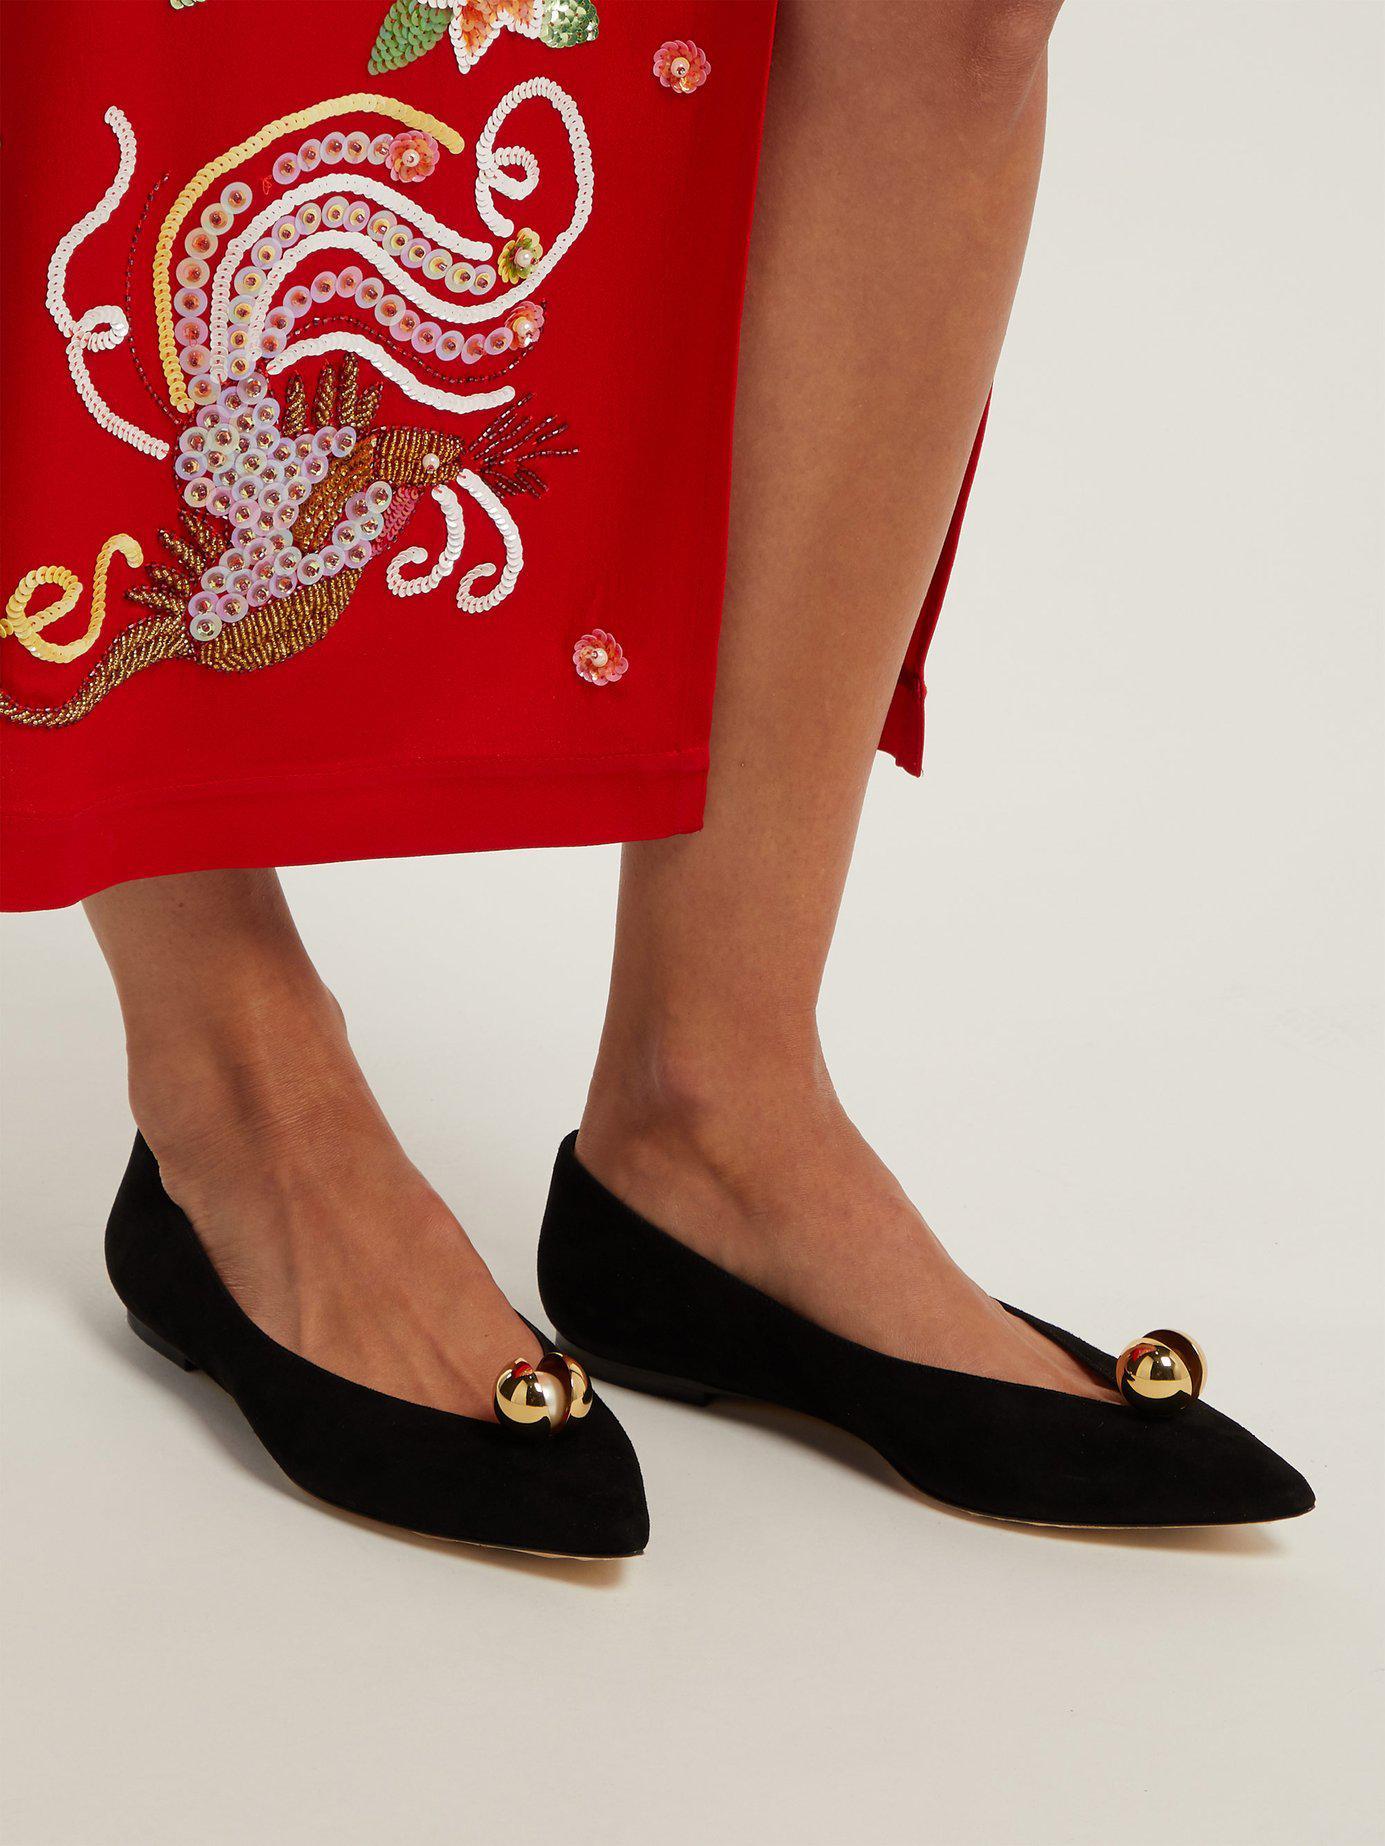 62e7dae1627 Lyst - Jimmy Choo Silvia Faux Pearl-embellished Leather Flats in Black